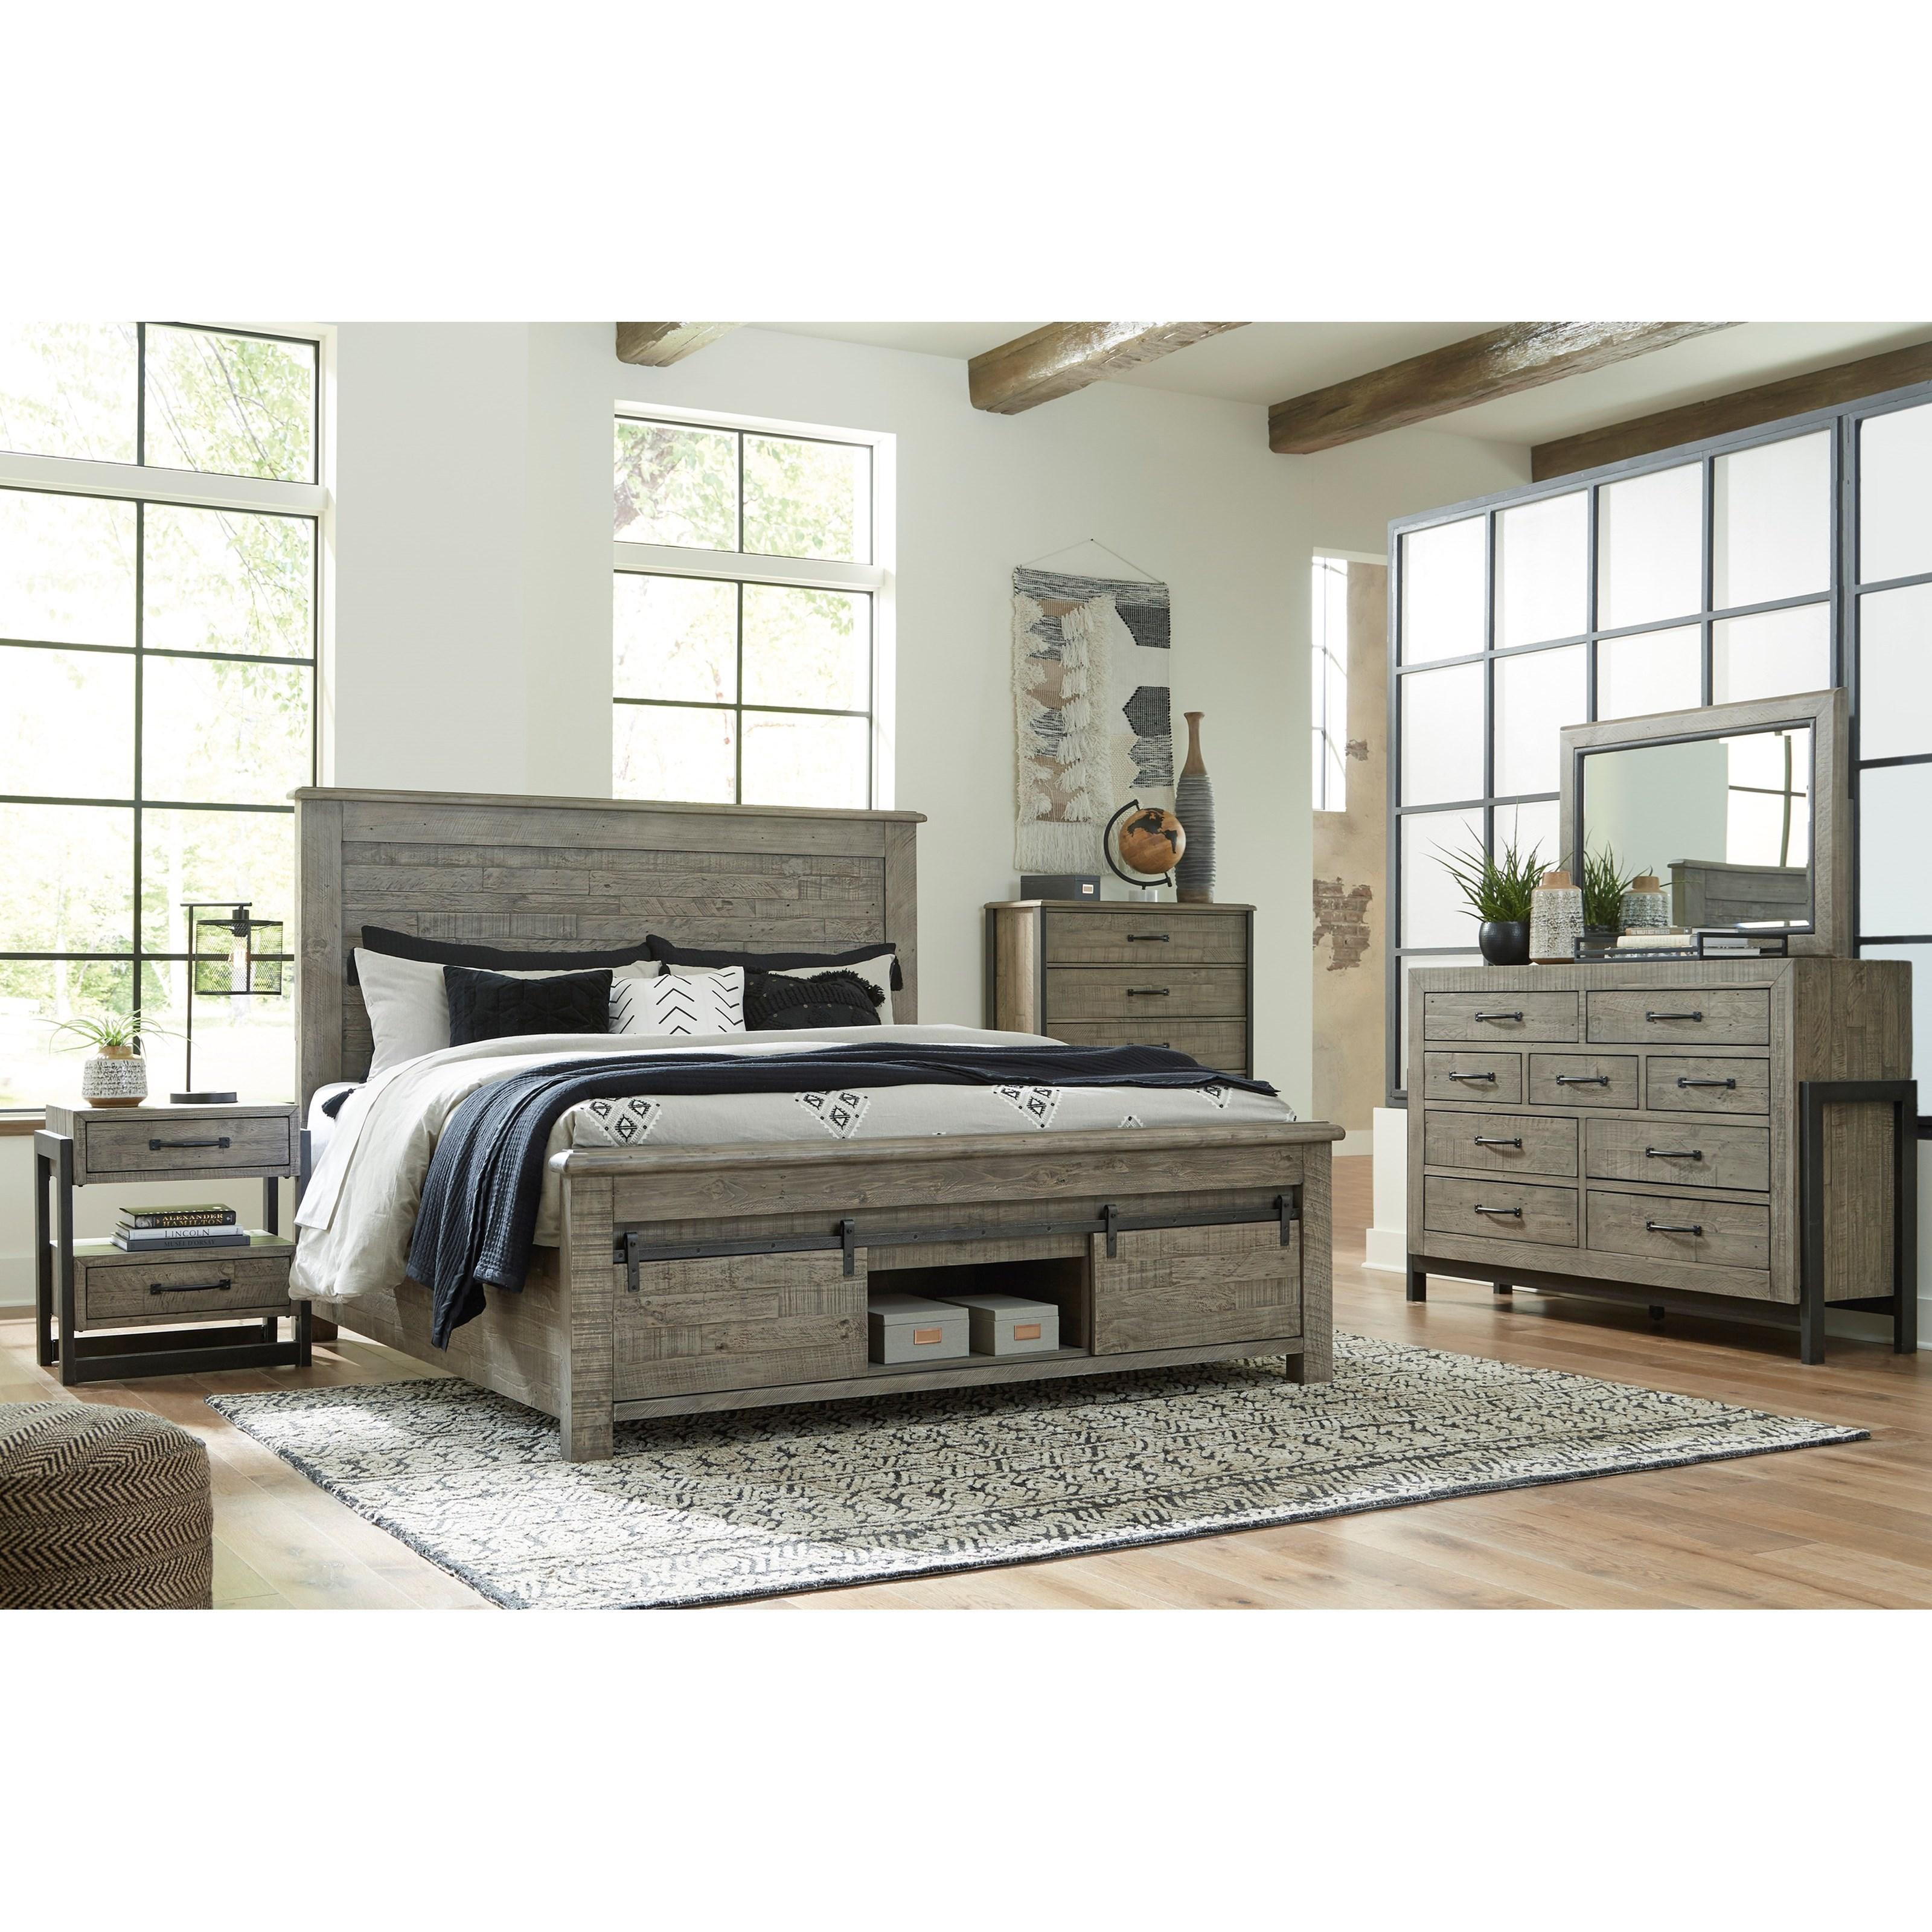 Brennagan King Bedroom Group by Ashley (Signature Design) at Johnny Janosik